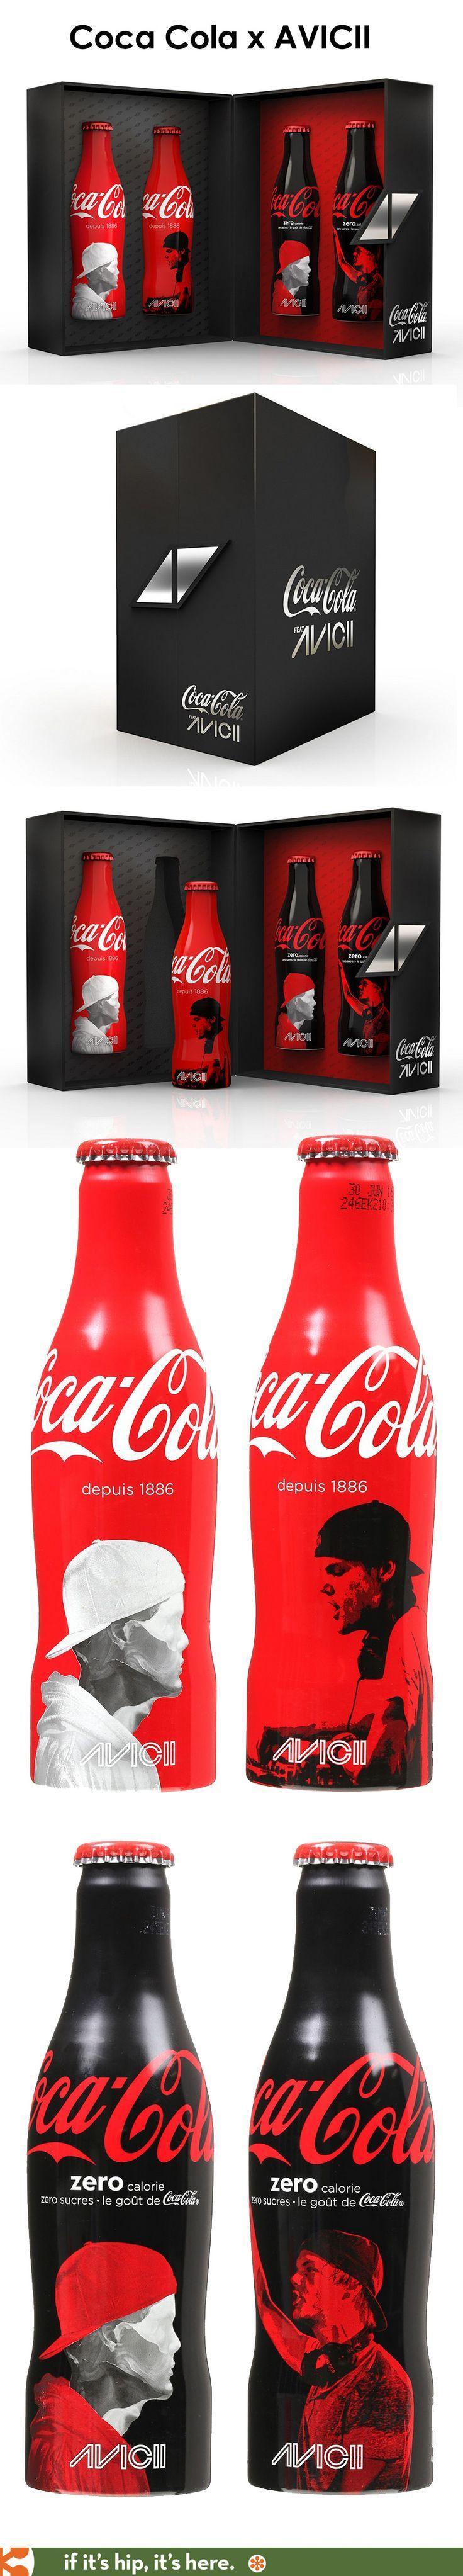 Coca Cola X AVICII limited edition gift set.